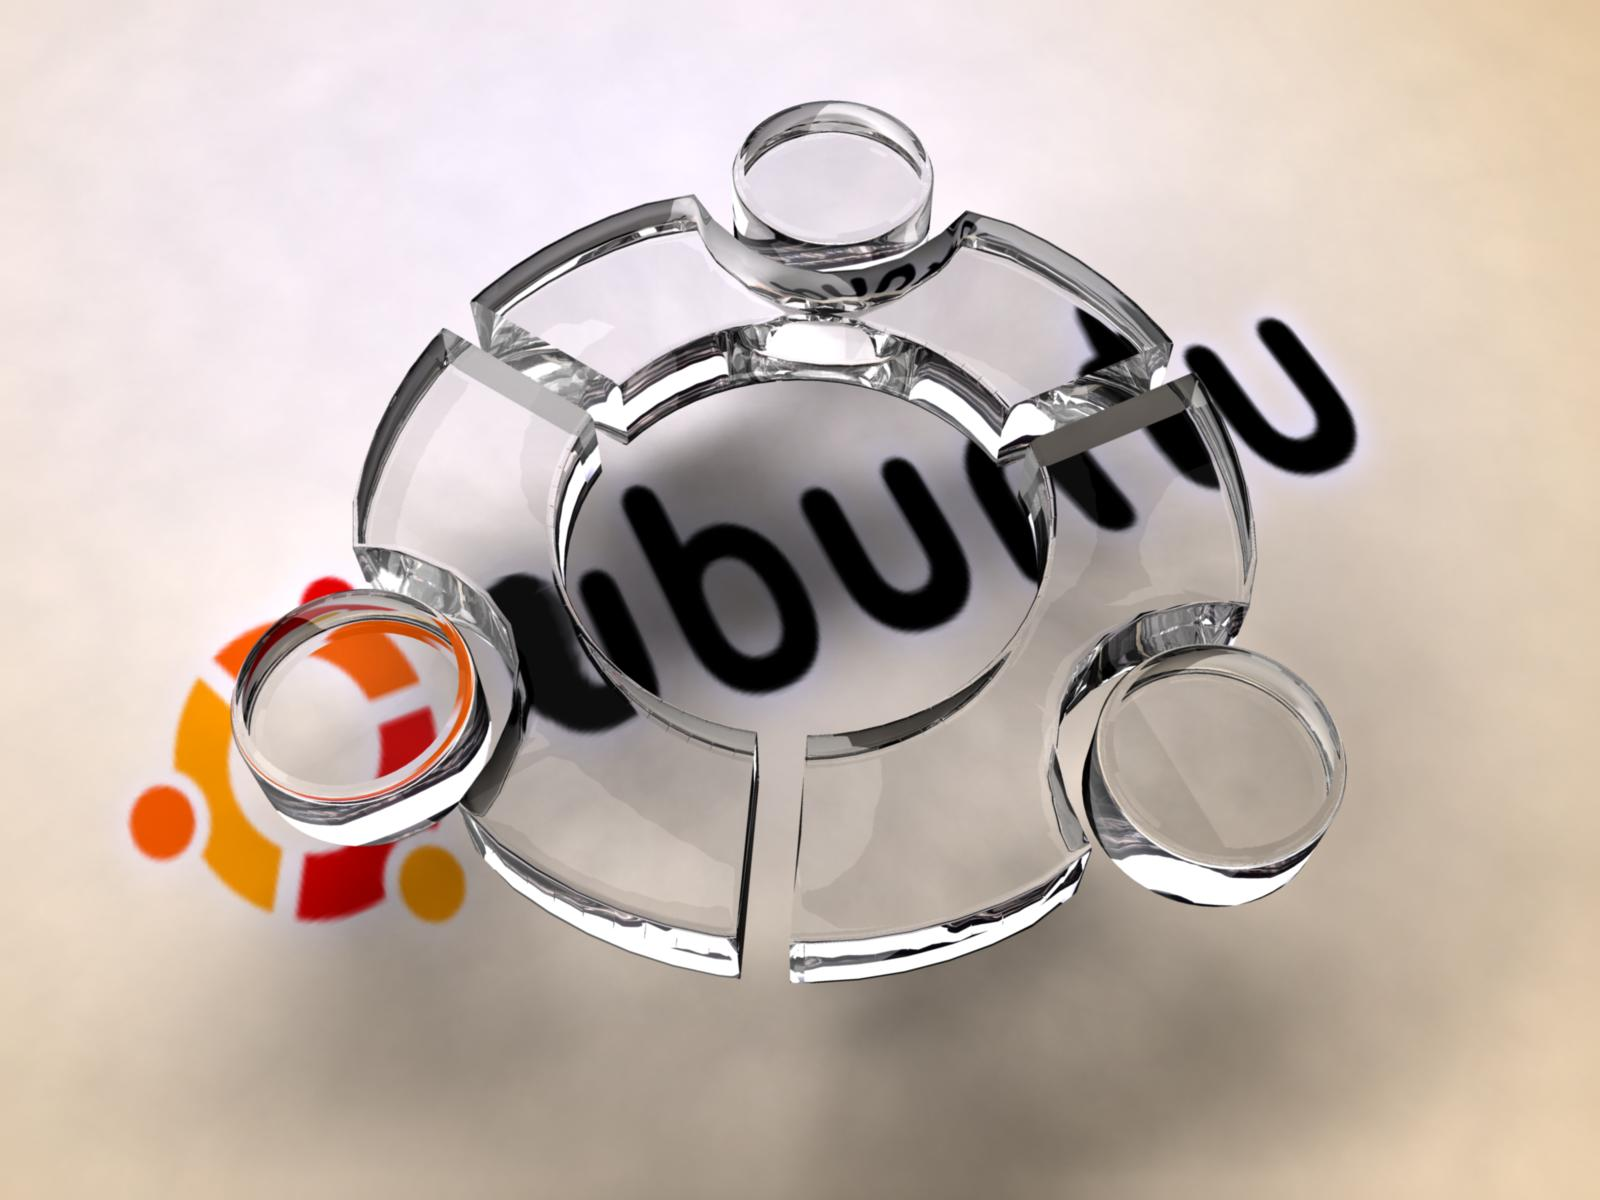 https://i0.wp.com/www.wallfizz.com/informatique/ubuntu/1940-ubuntu-WallFizz.jpg